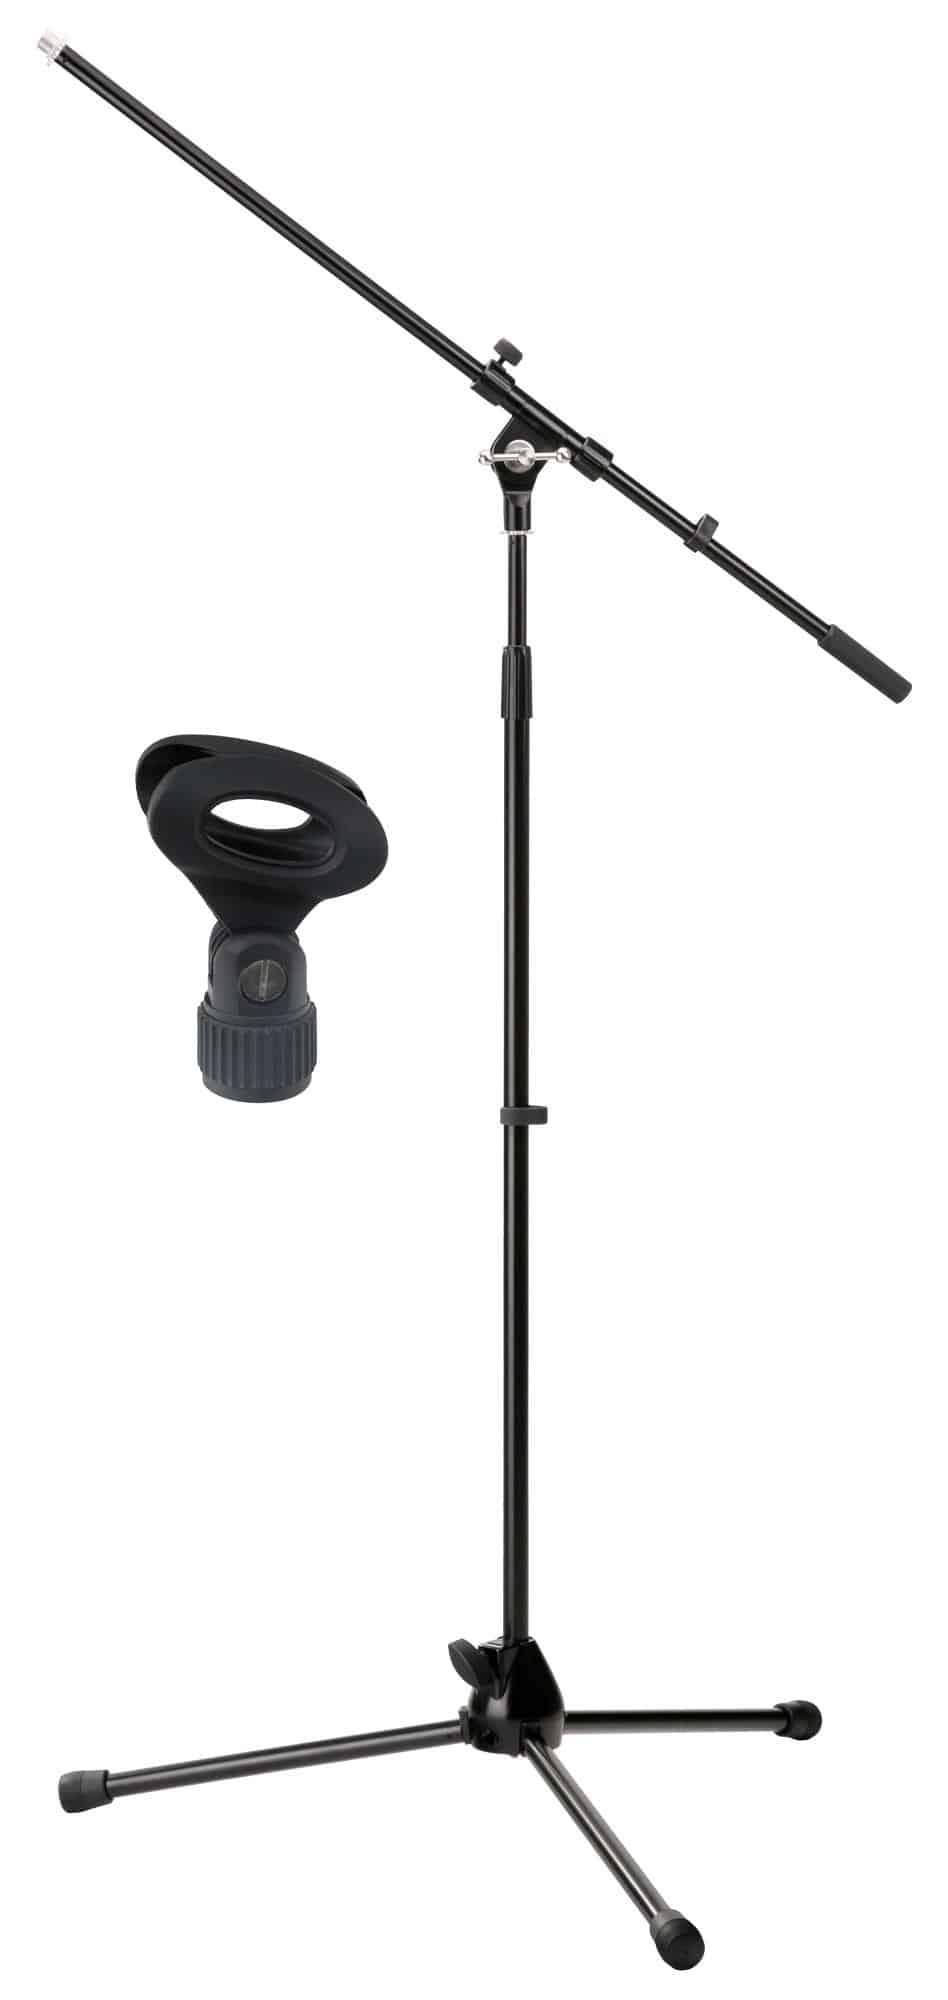 Studiozubehoer - Pronomic MS 15 Pro Mikrofonstativ Schwarz mit Mikrofonklemme - Onlineshop Musikhaus Kirstein